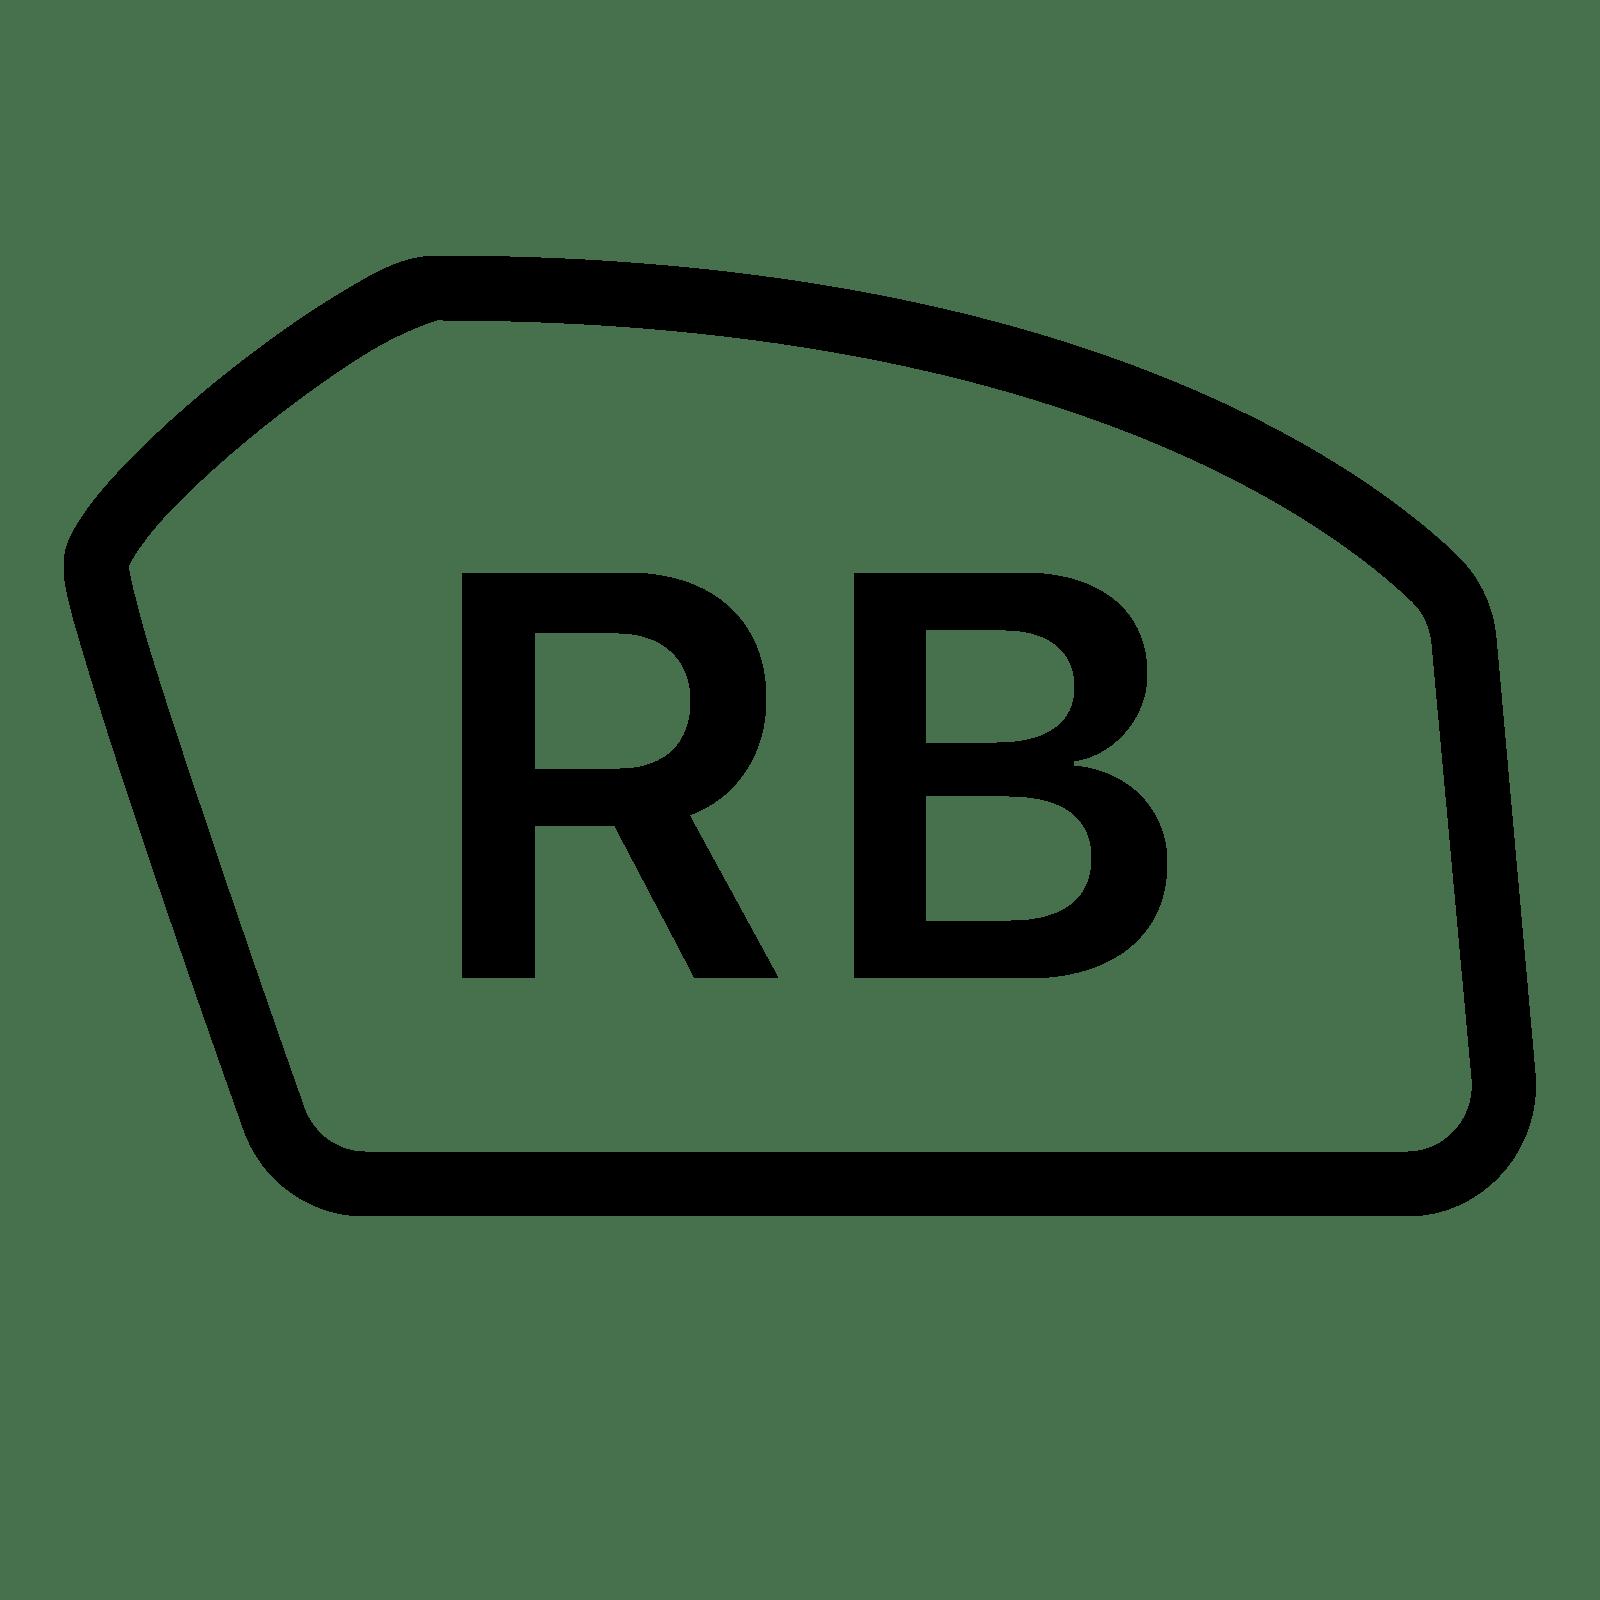 Xbox Rb Icono